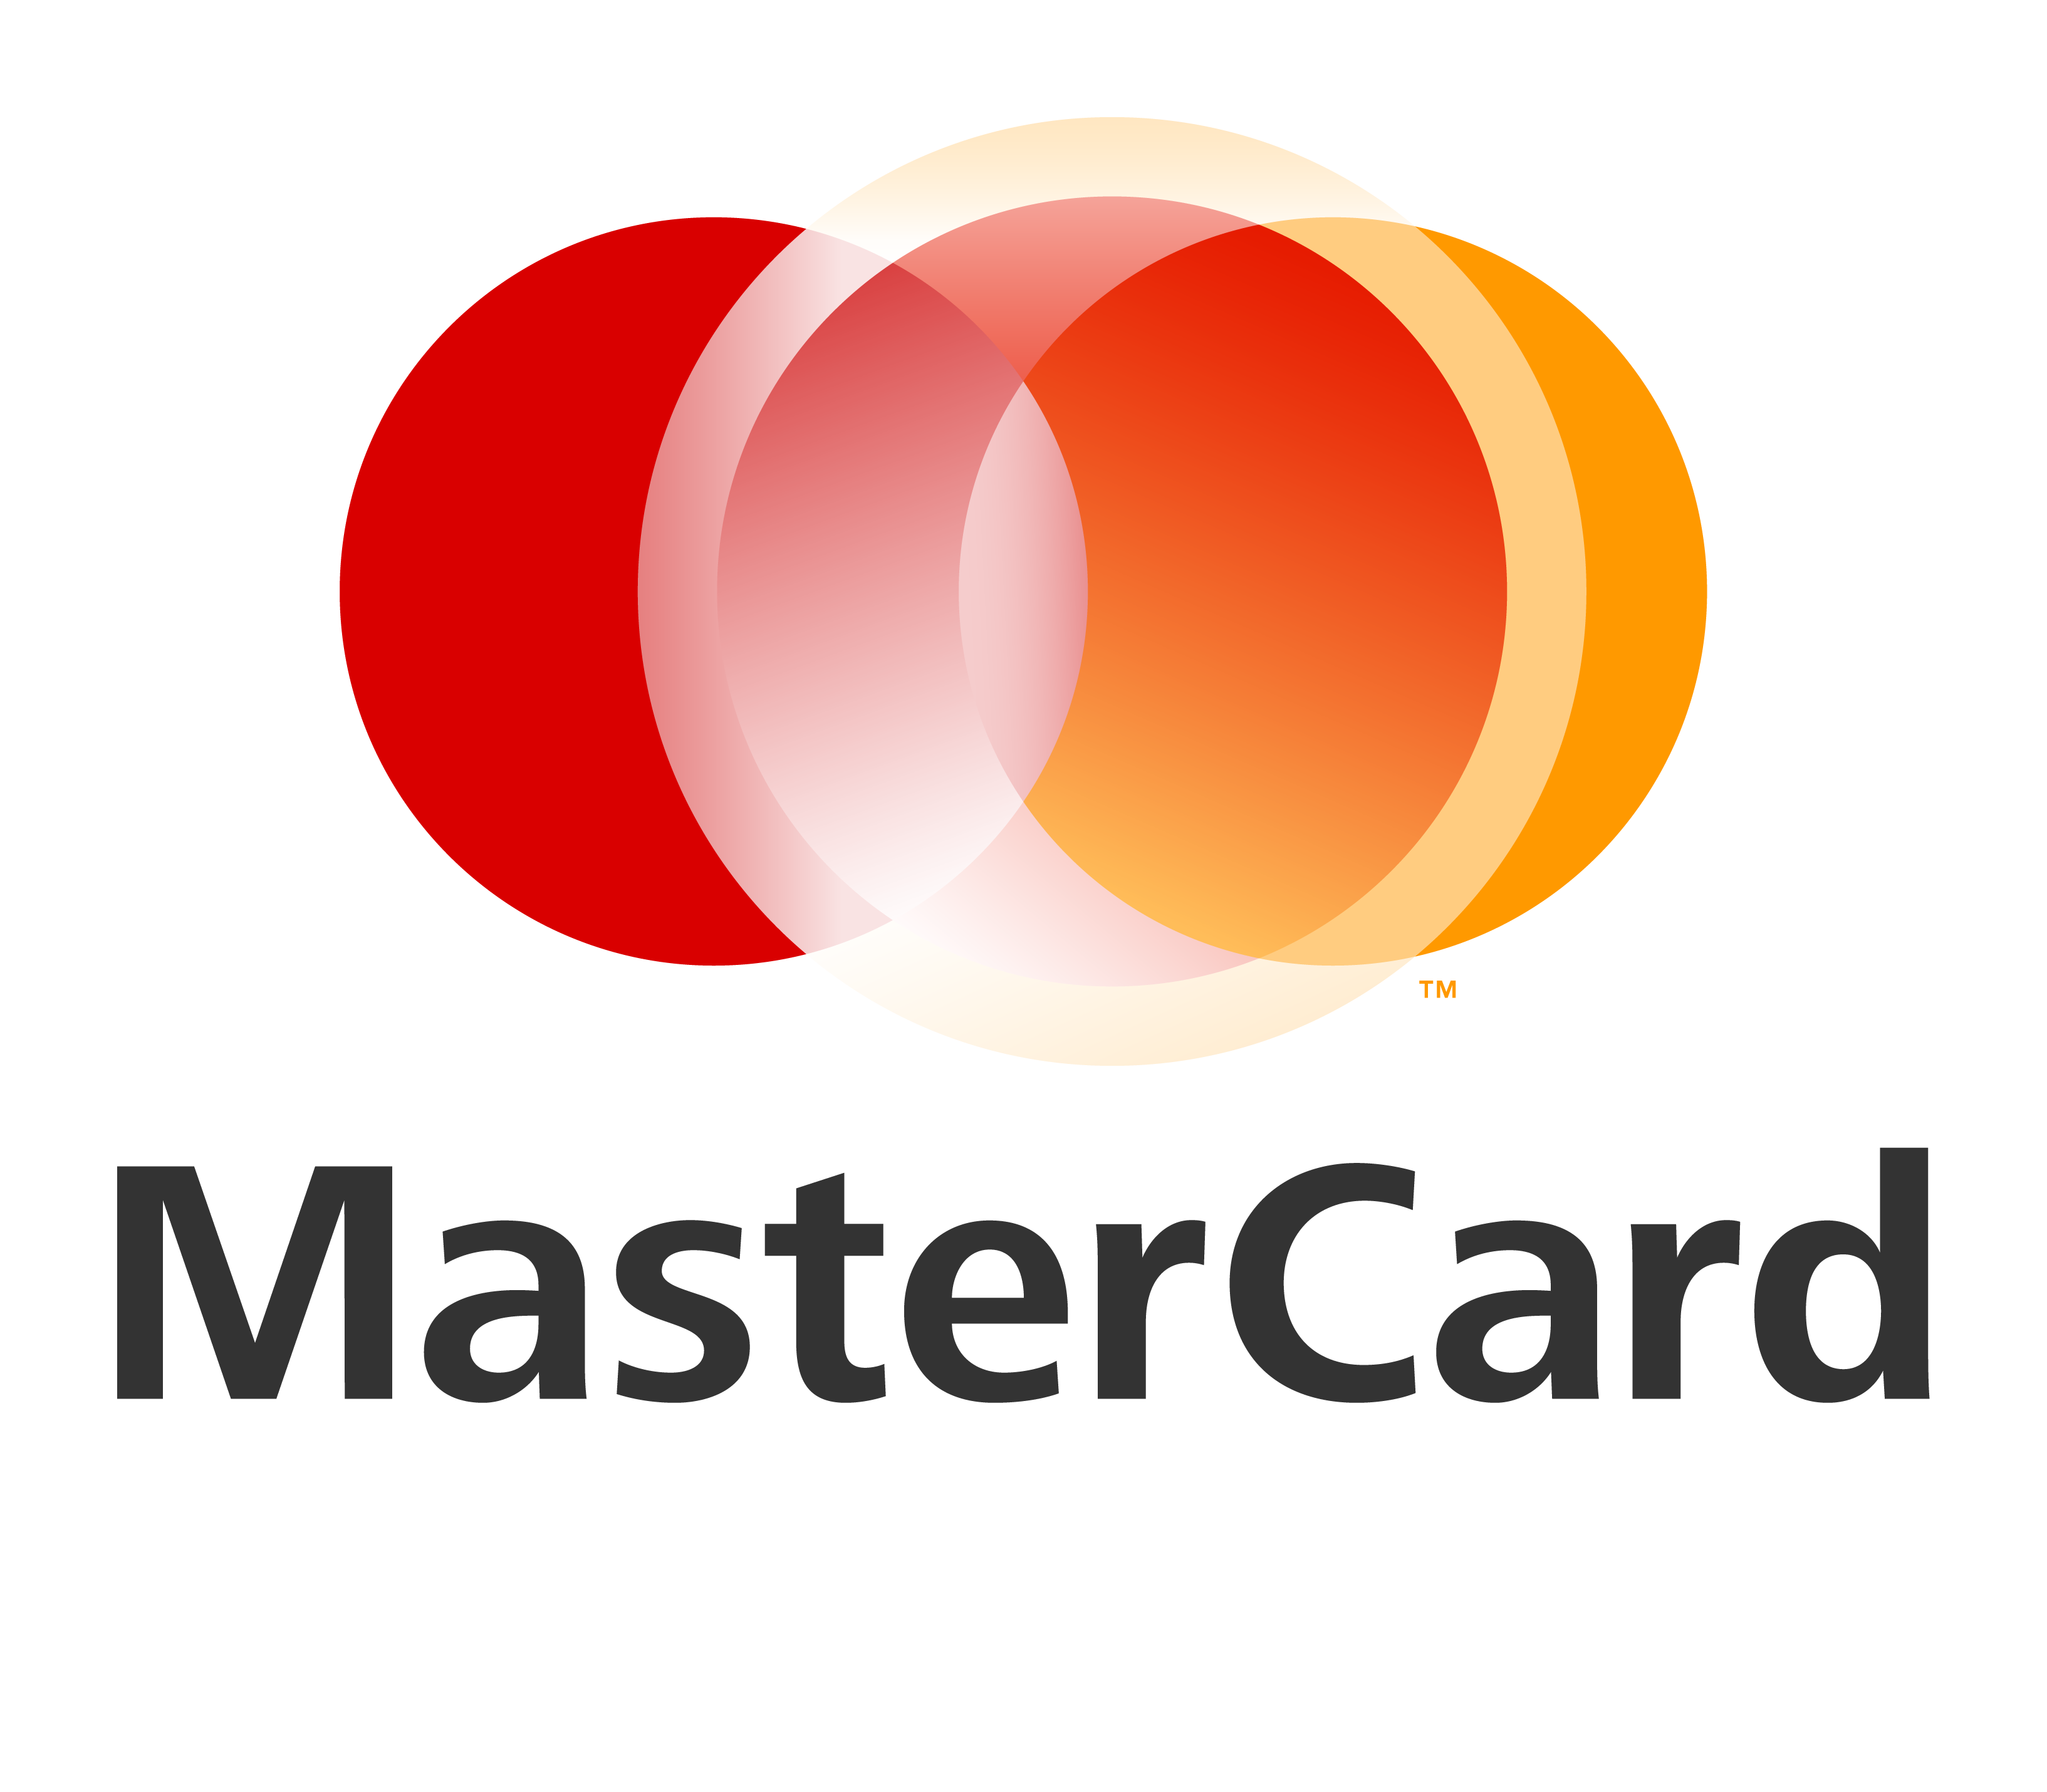 Photos Mastercard Logo PNG Images-Photos Mastercard Logo PNG Images-15